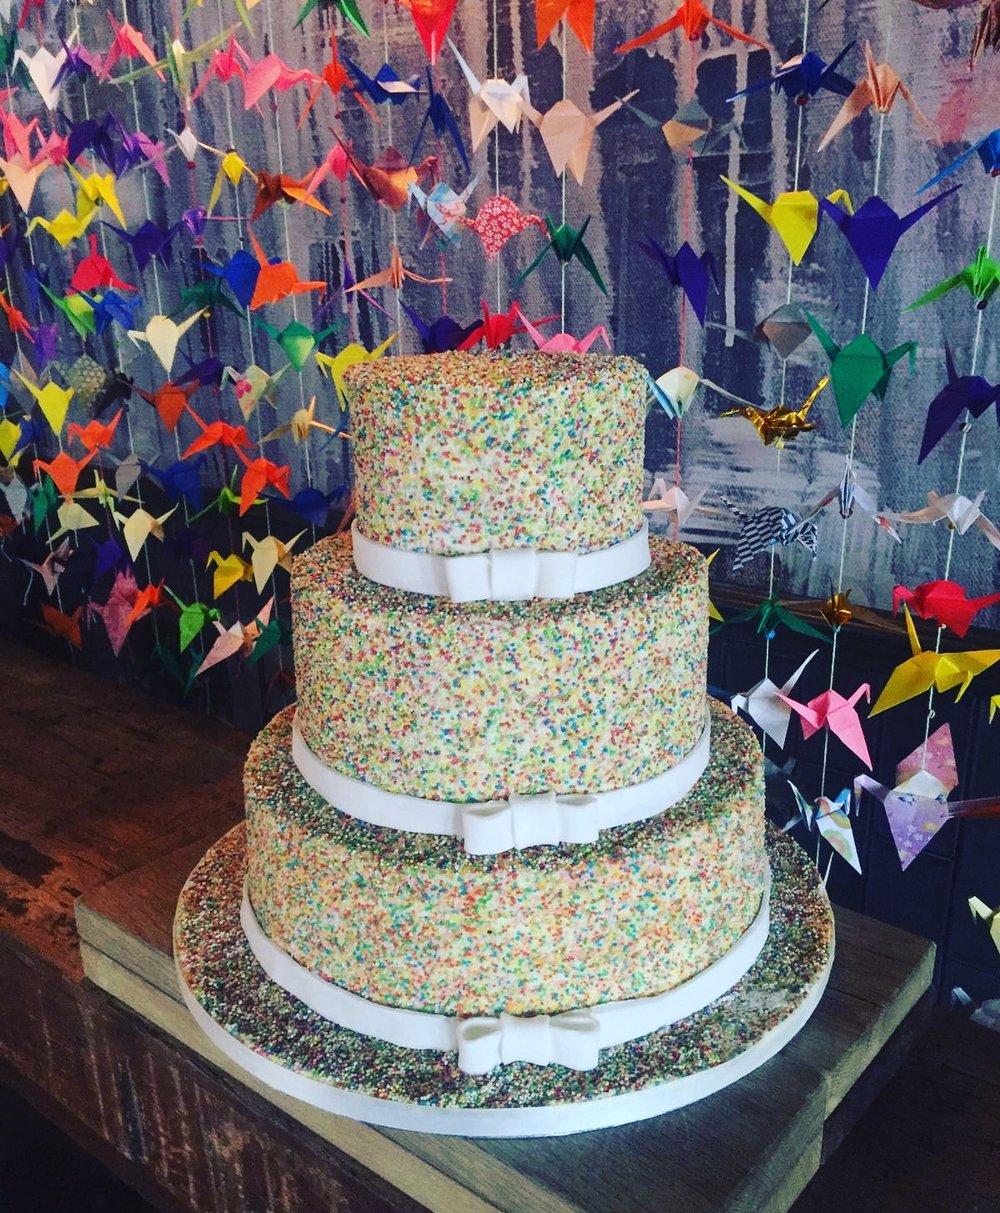 The confetti cake - a colourful and fun buttercream cake